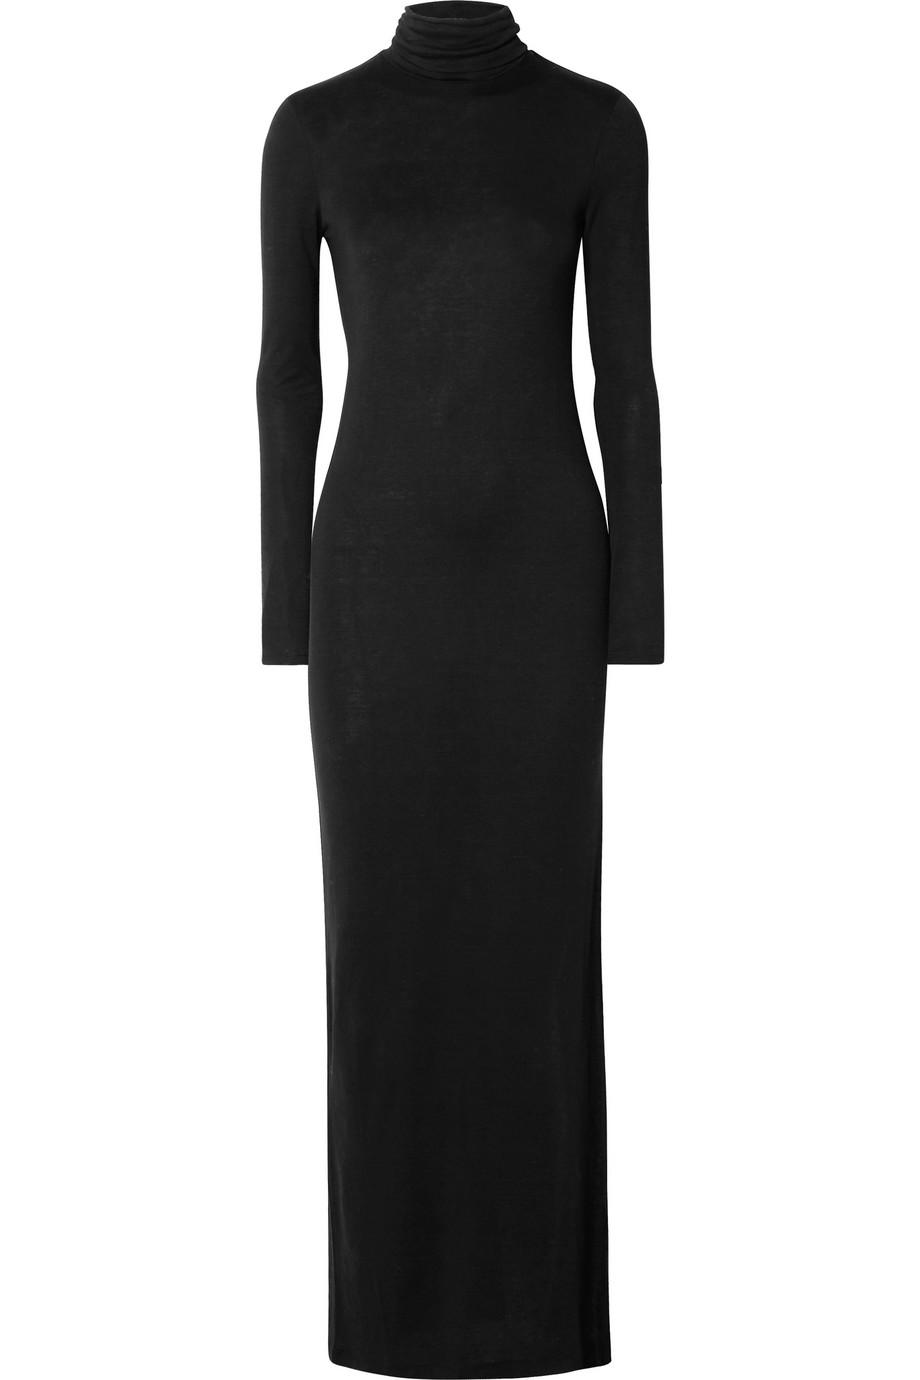 Ninety Percent | Stretch-Tencel turtleneck maxi dress | NET-A-PORTER.COM